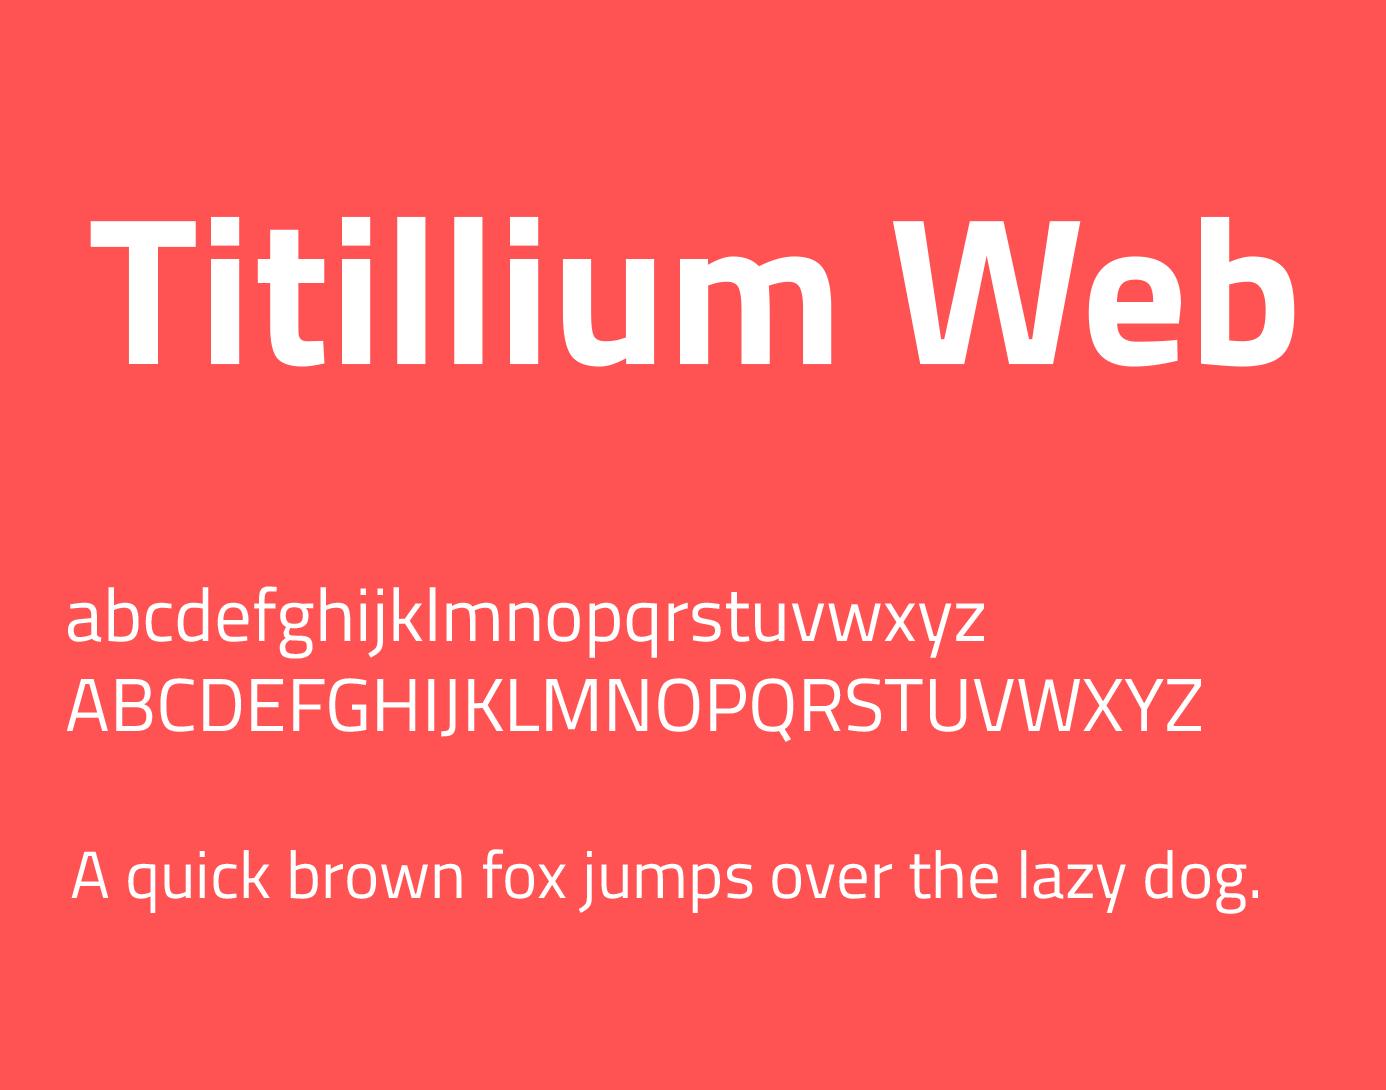 https://fontclarity.com/wp-content/uploads/2019/09/titillium-web-download-0.png Free Download